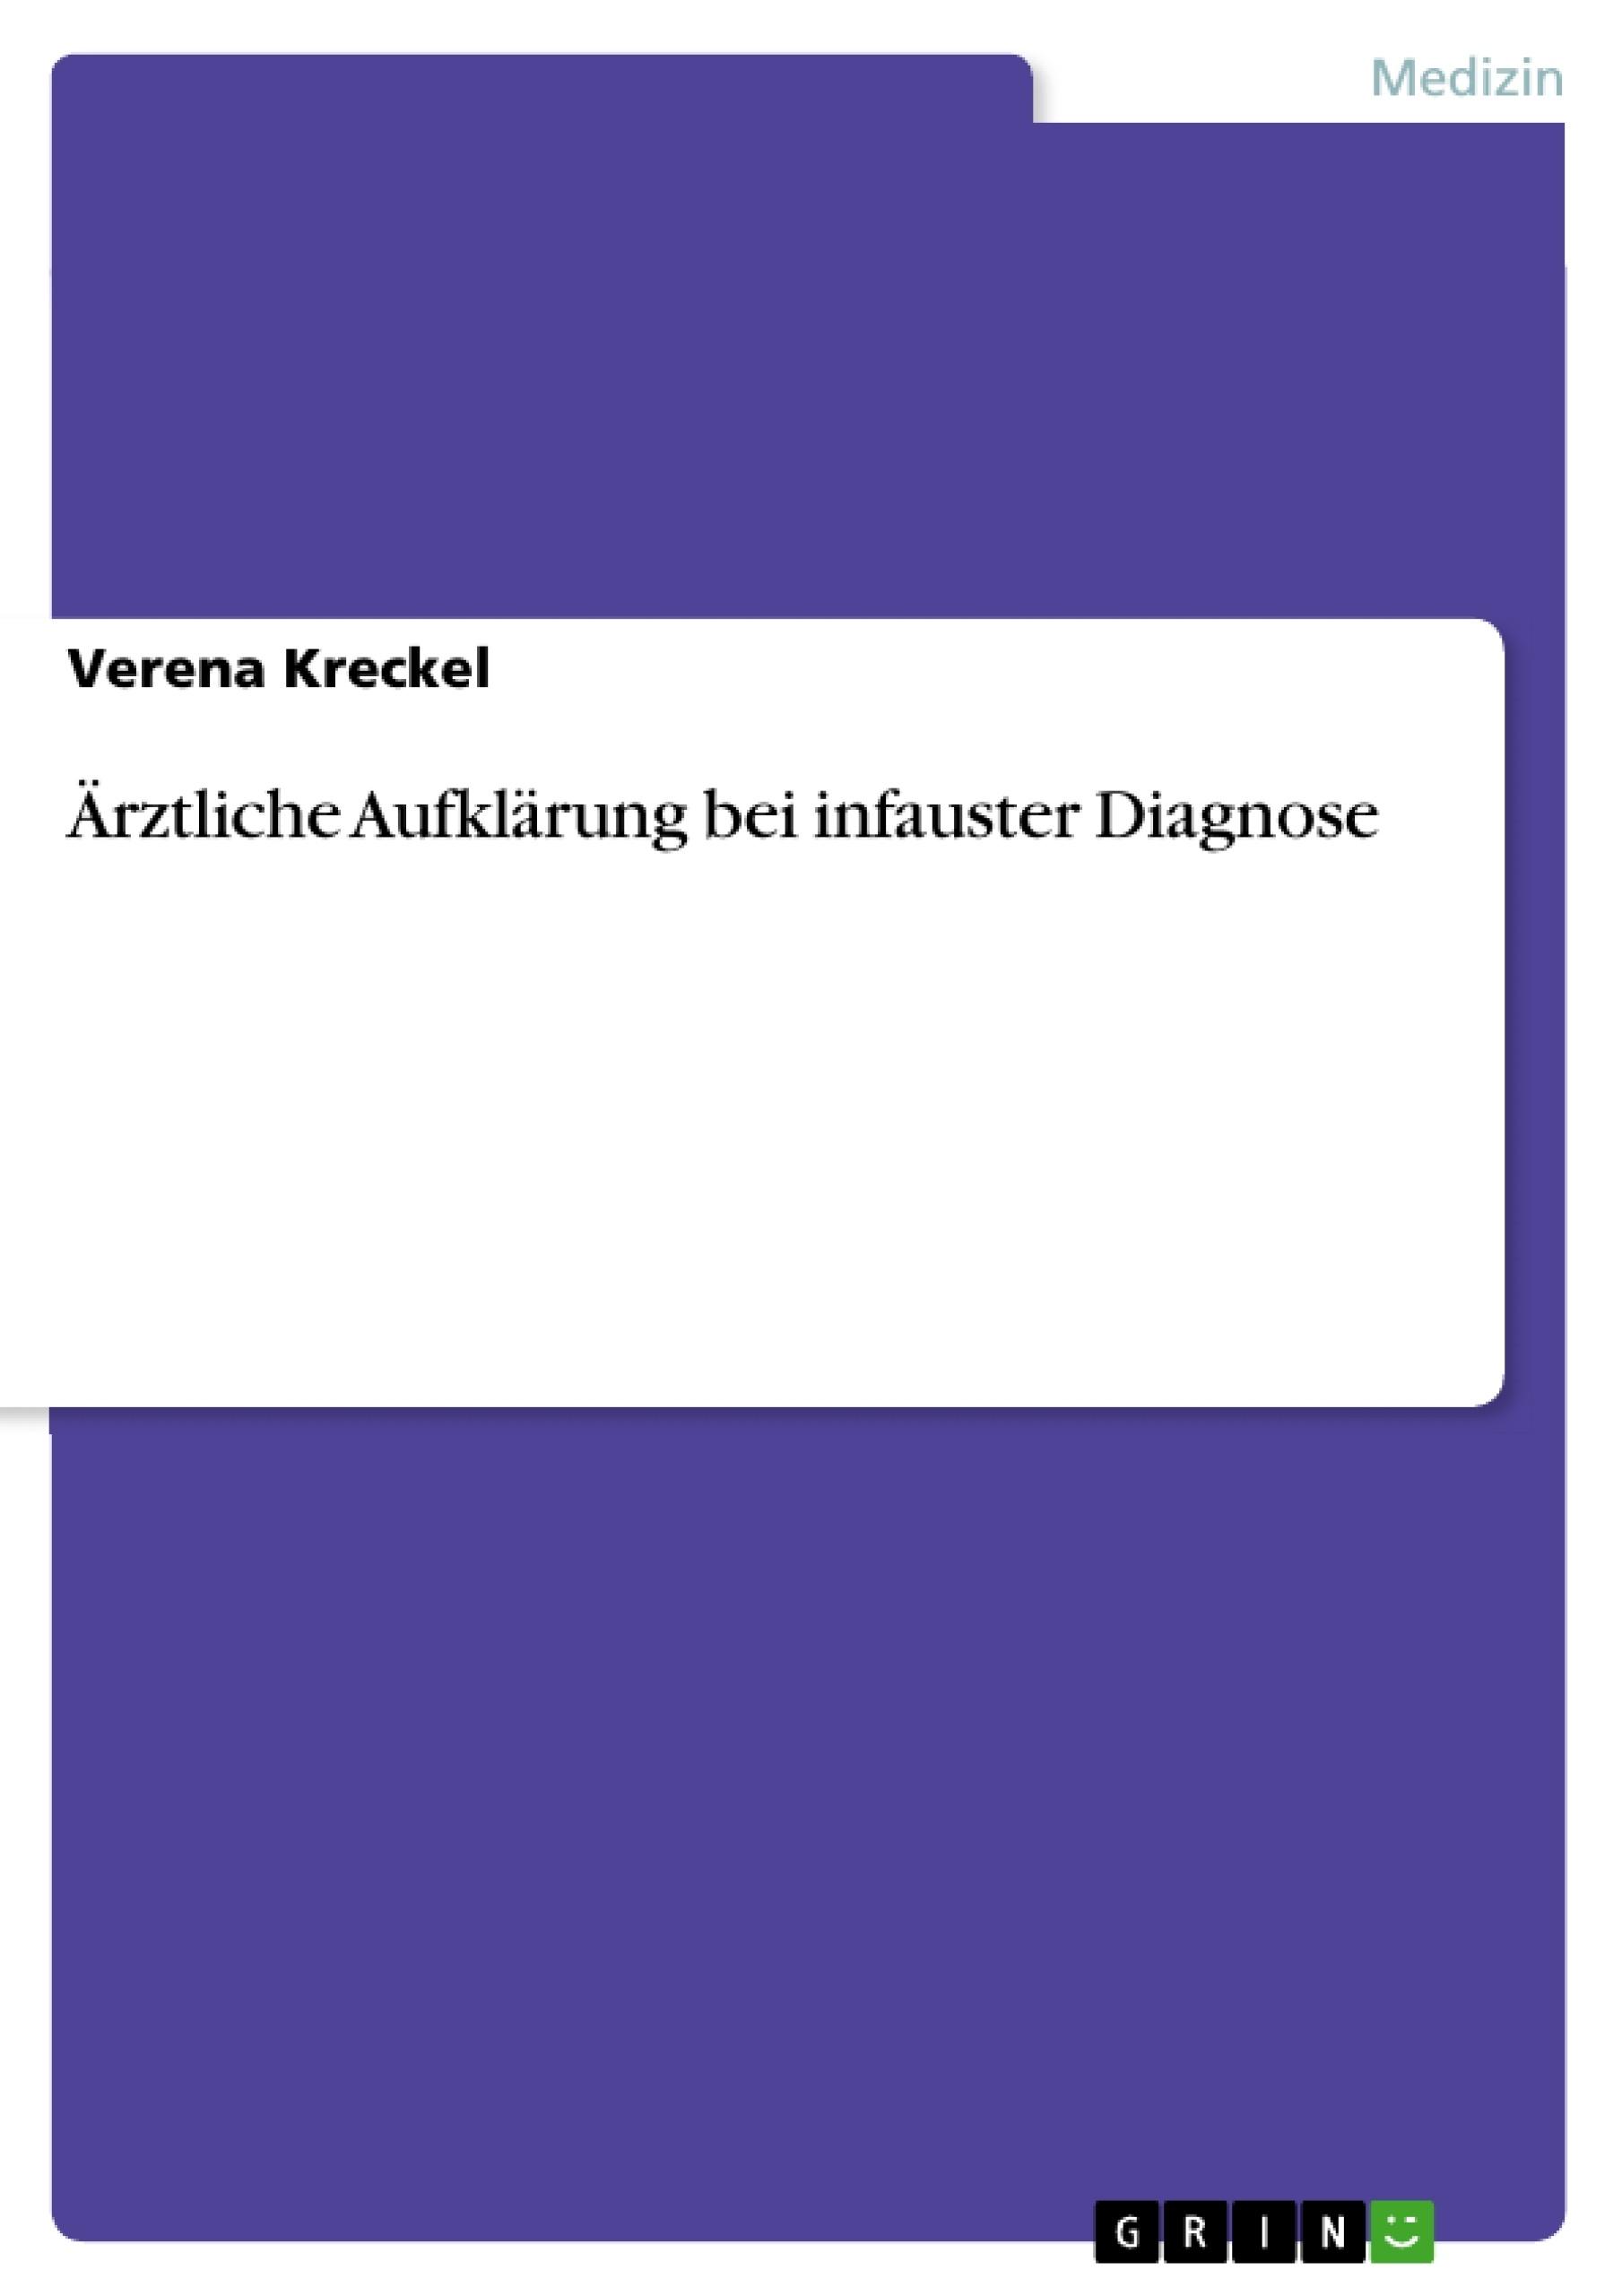 Titel: Ärztliche Aufklärung bei infauster Diagnose